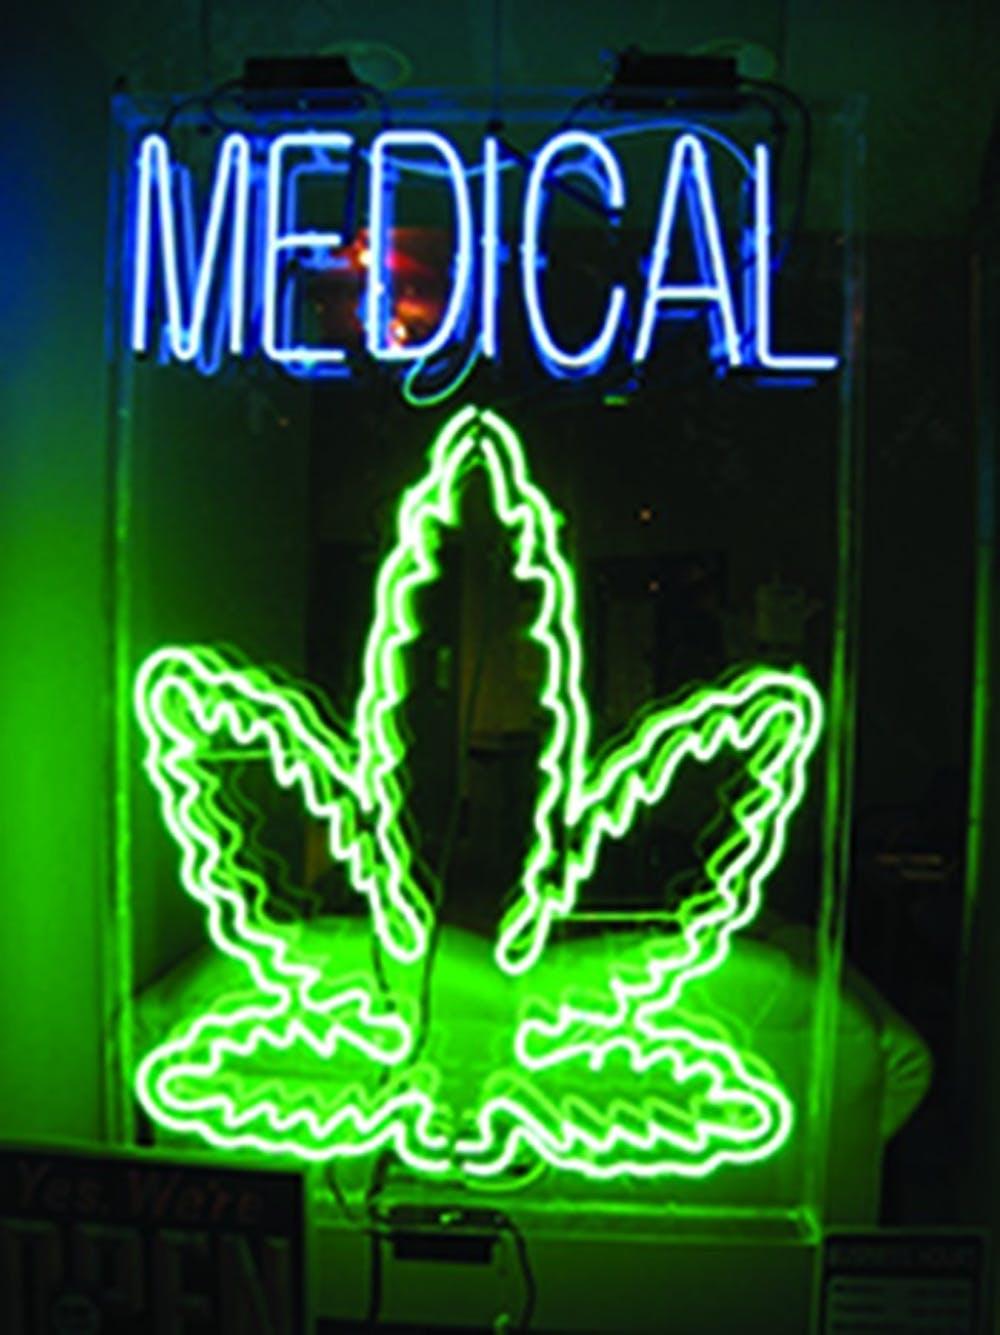 Quality of life: The legality battle of medicinal marijuana